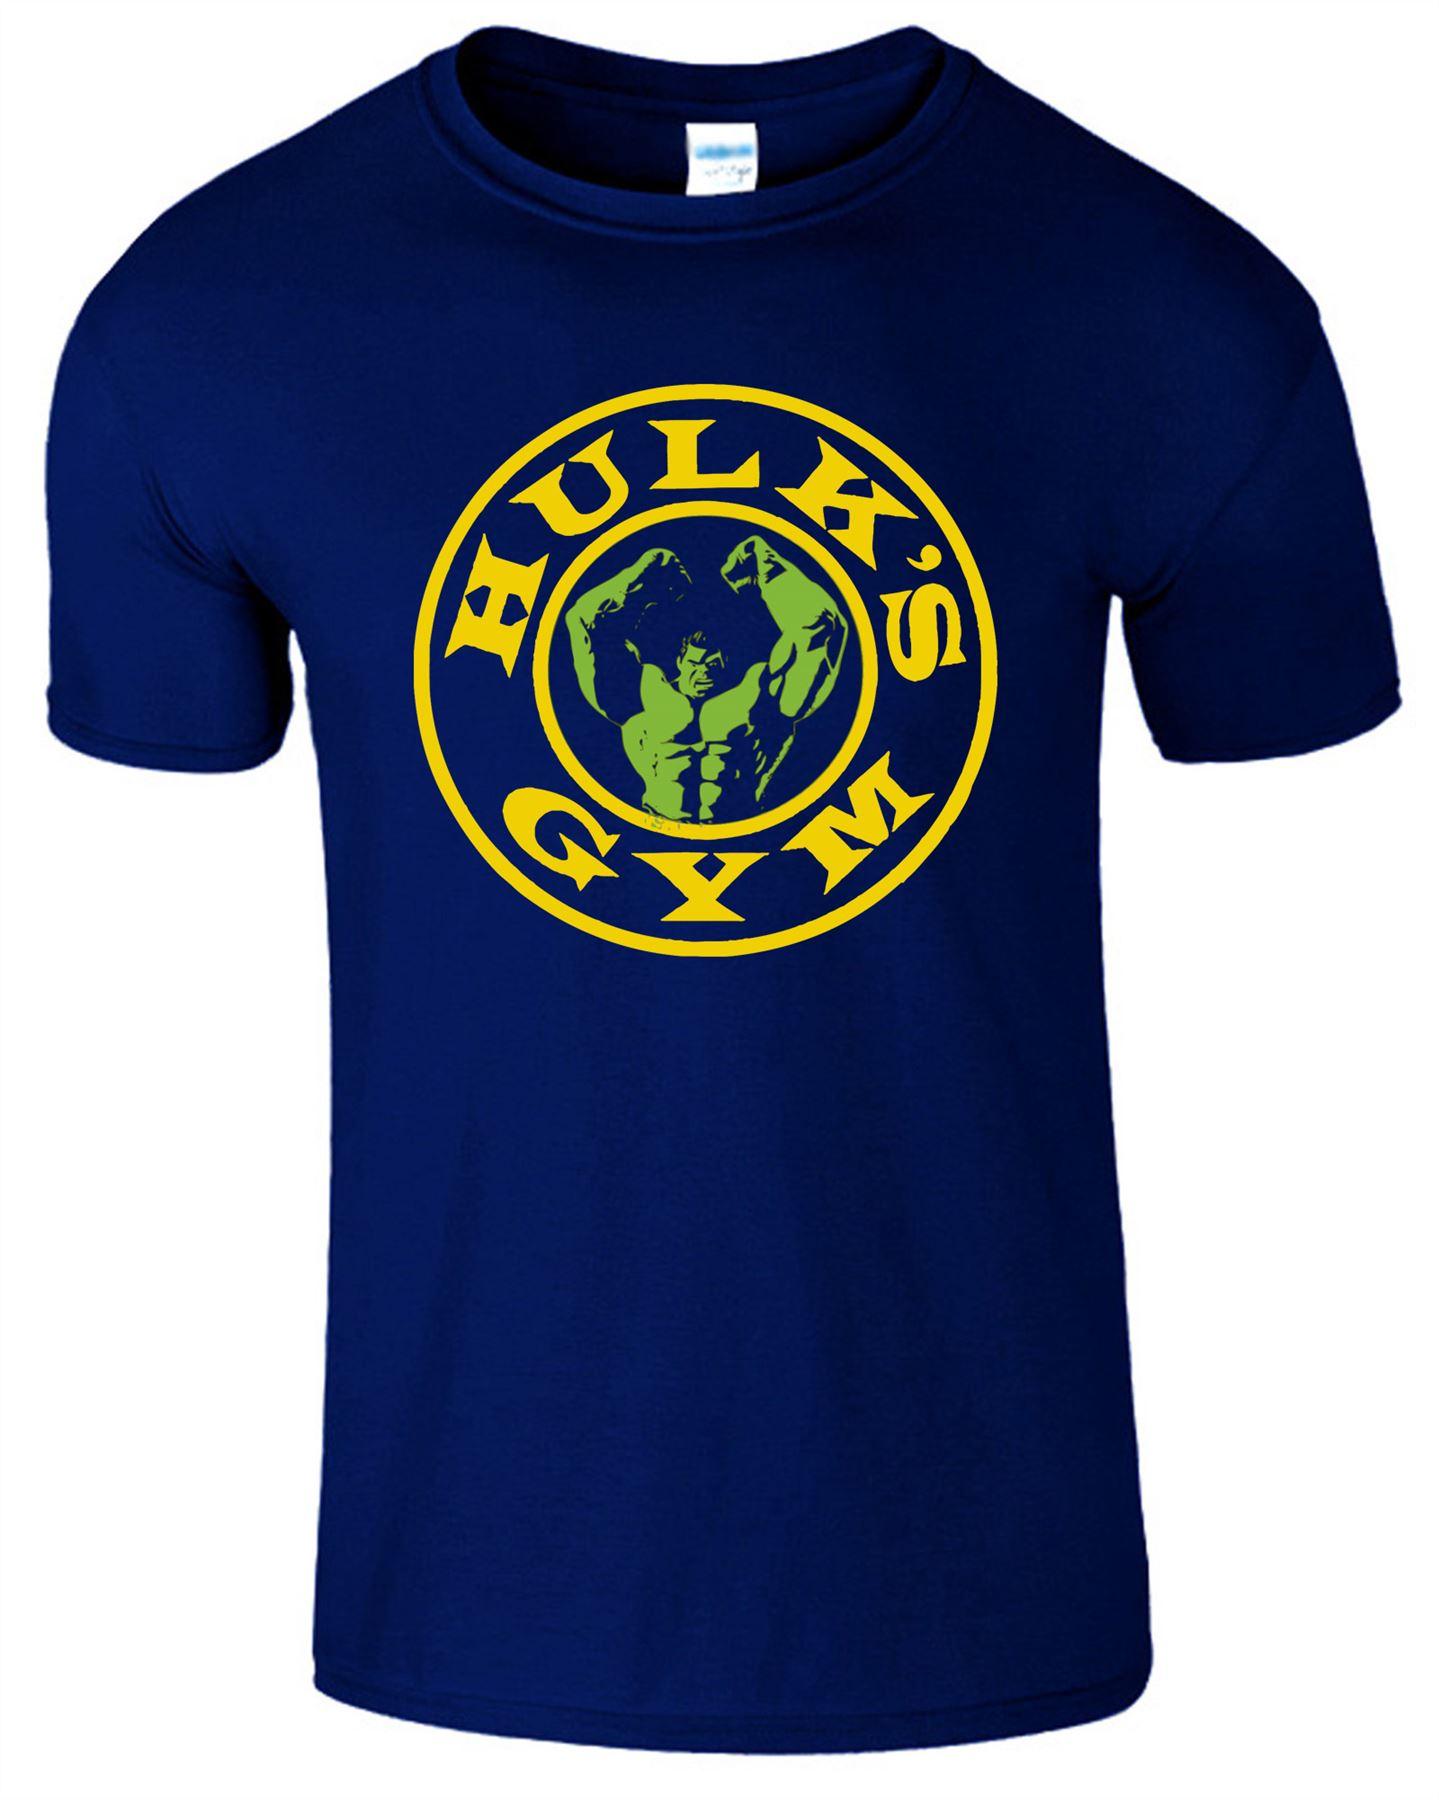 Hulk Gym Mens Style T Shirt Gym Training Cage Workout